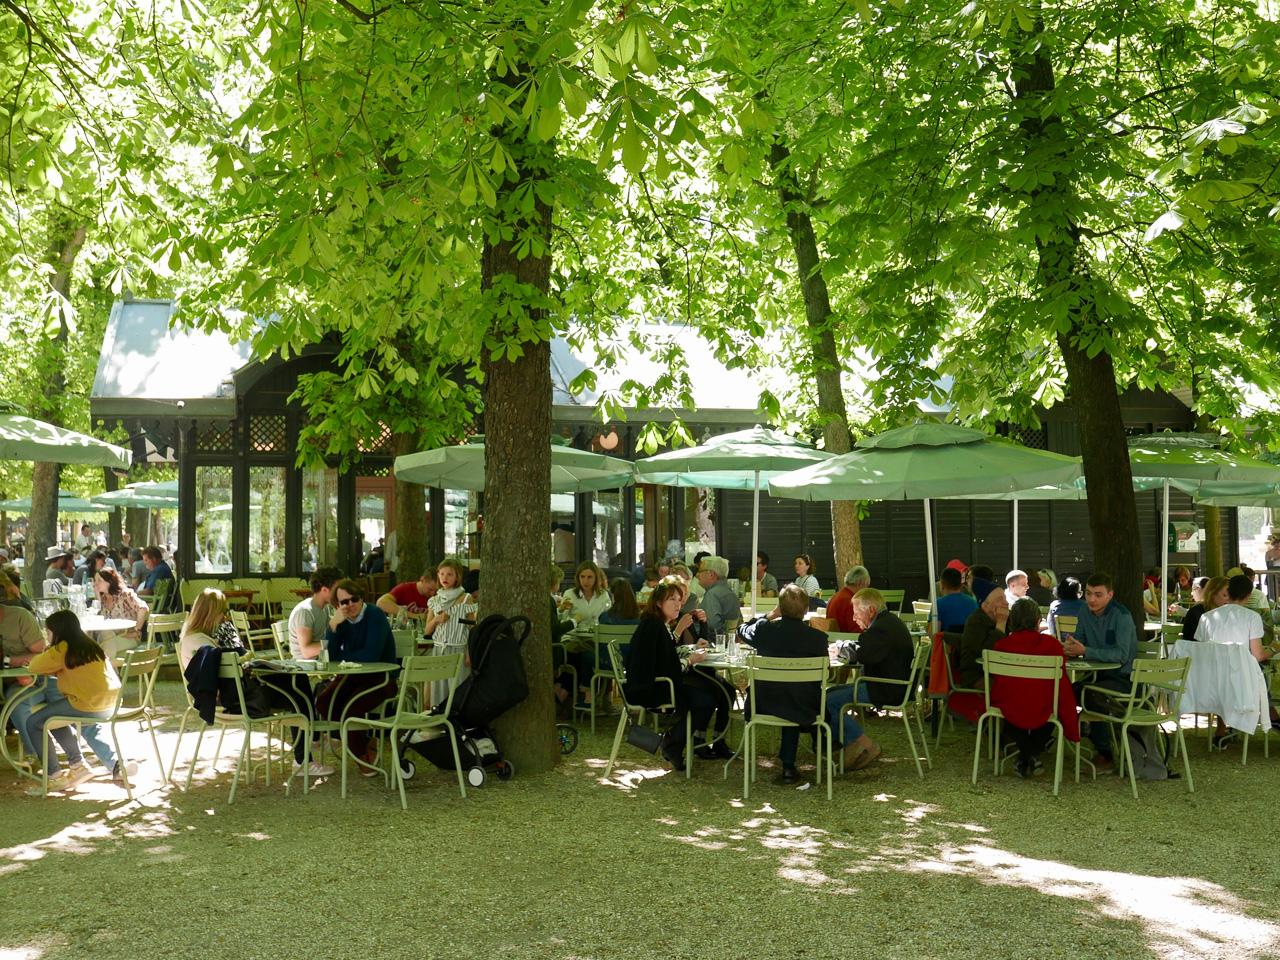 Paris Photos: Jardin Du Luxembourg – Cara Sharratt Travel concernant Jardin De Luxembourg Hotel